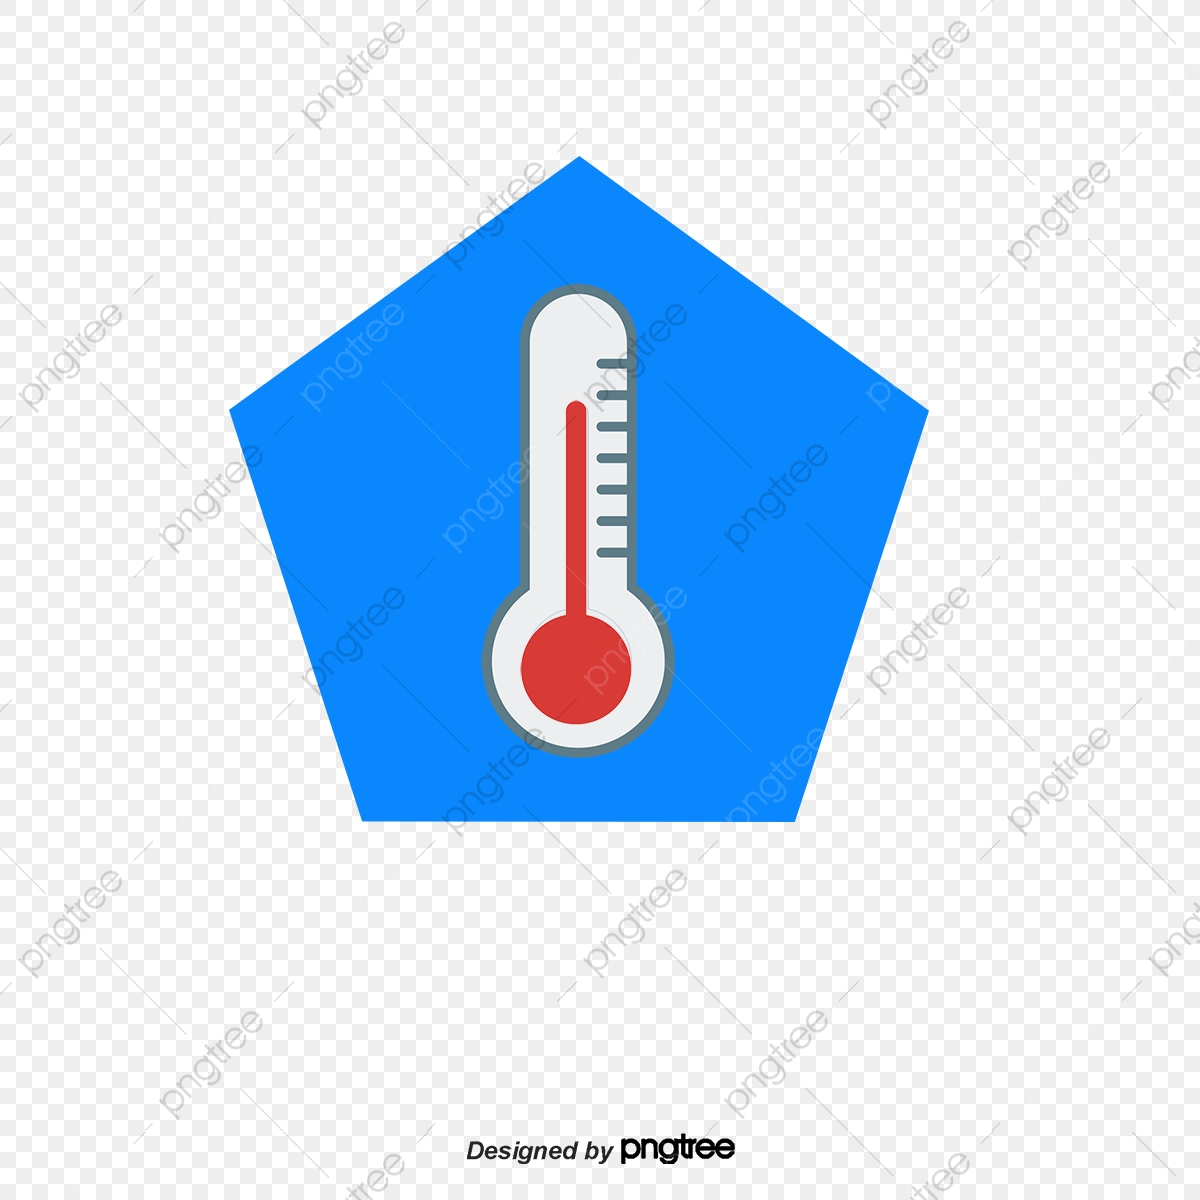 Vector Termometro Termometro Cuarto Conde Metro Png Y Psd Para Descargar Gratis Pngtree Icona termometro in altri stili. https es pngtree com freepng vector thermometer 2562972 html